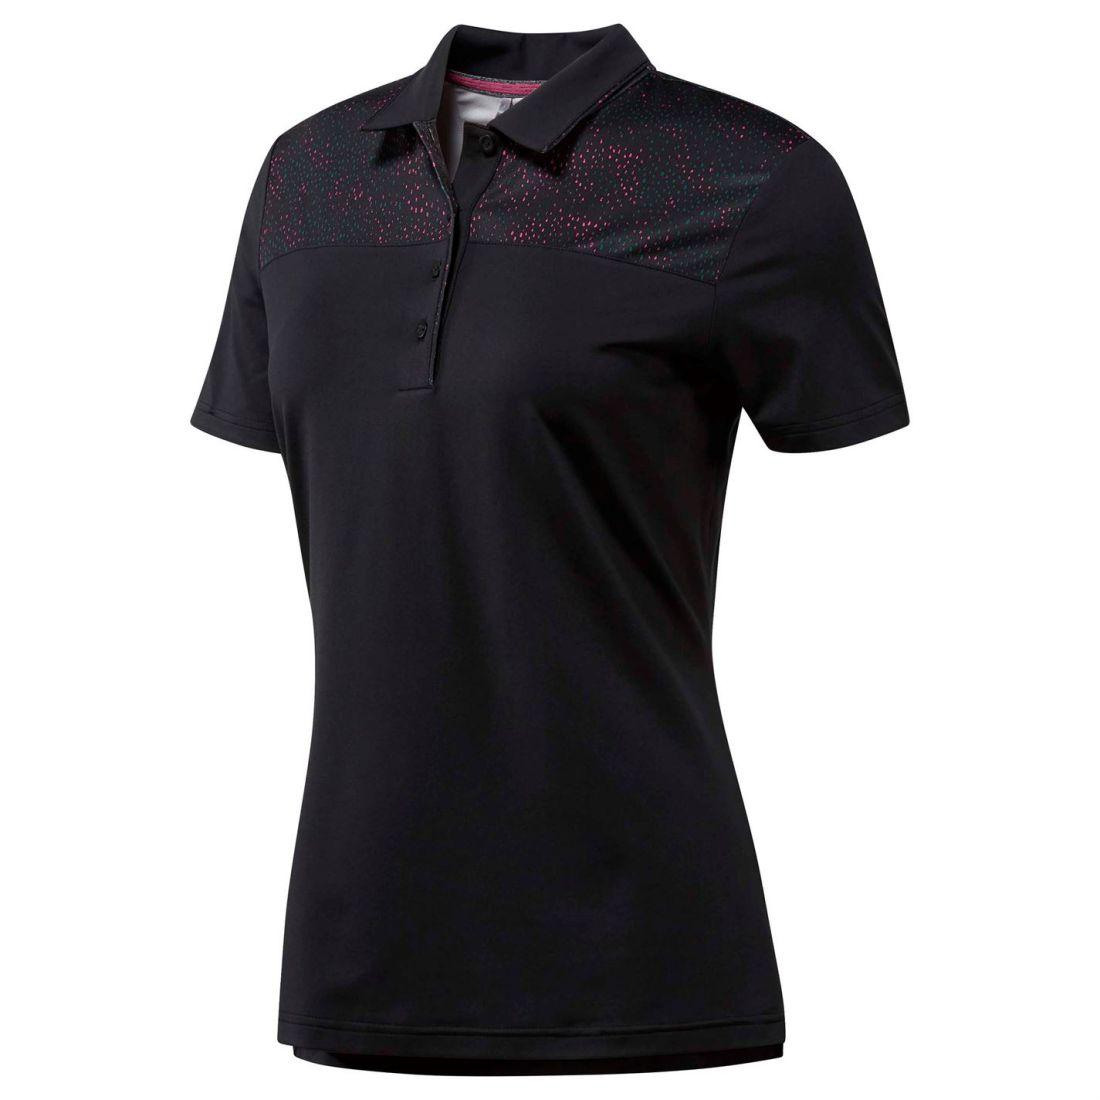 Adidas Ulti Fsh Polo Ladies Short Sleeve Performance Shirt Tee Top